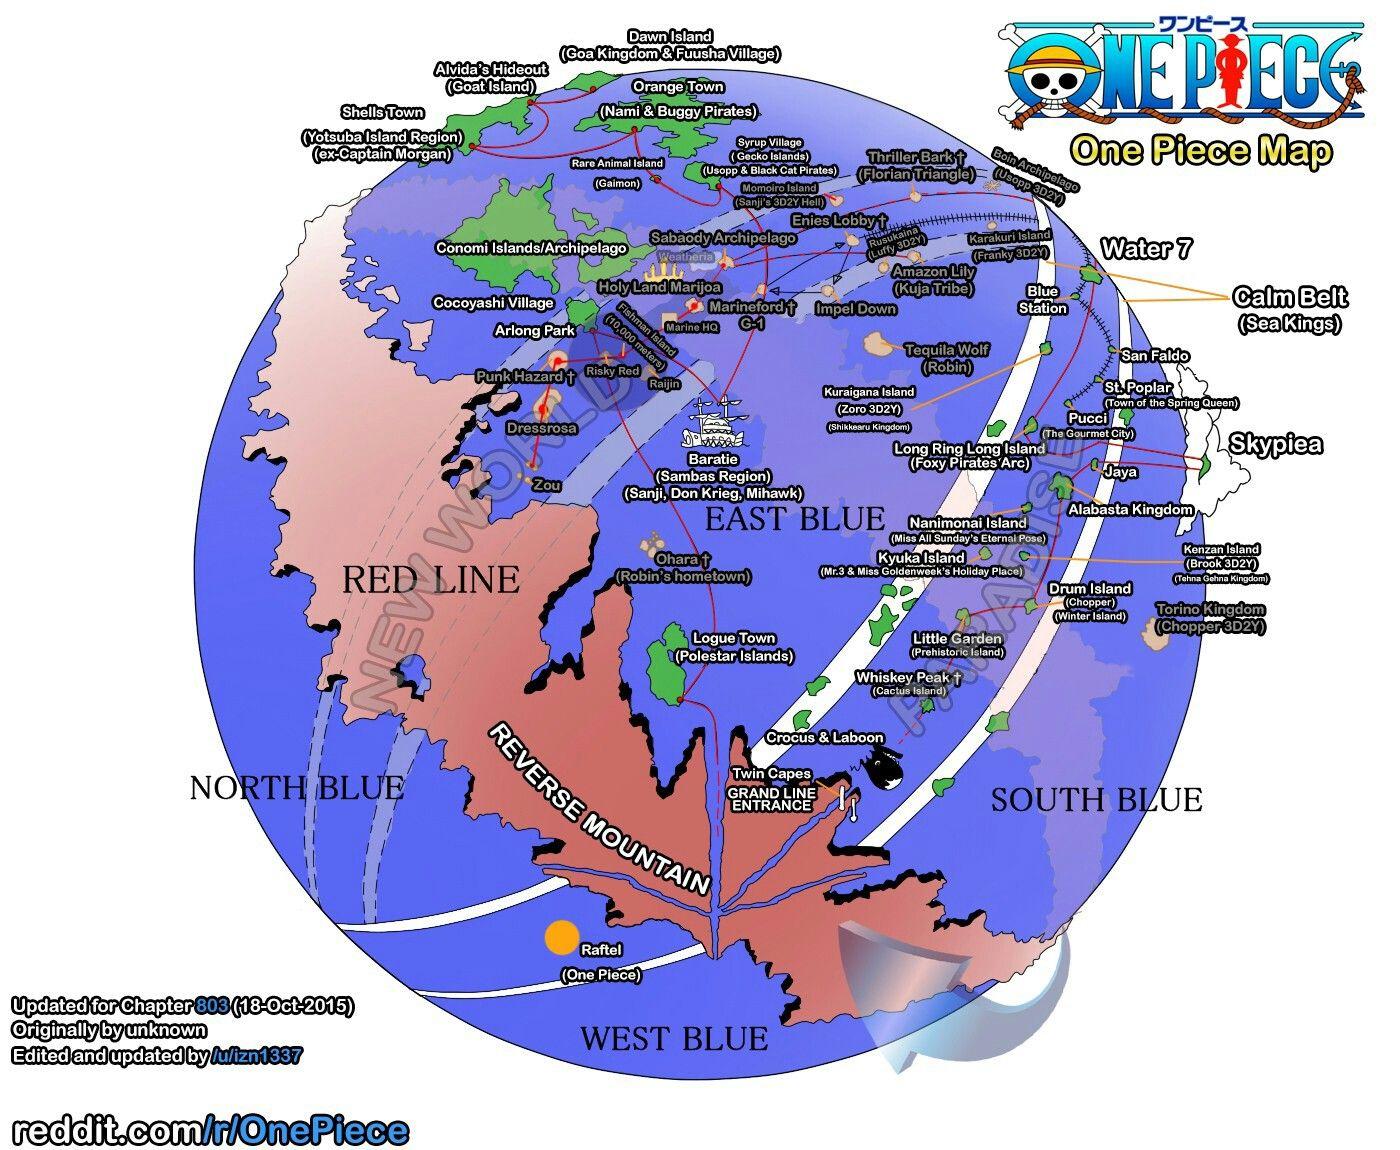 One Piece Grand Line Map Dessin